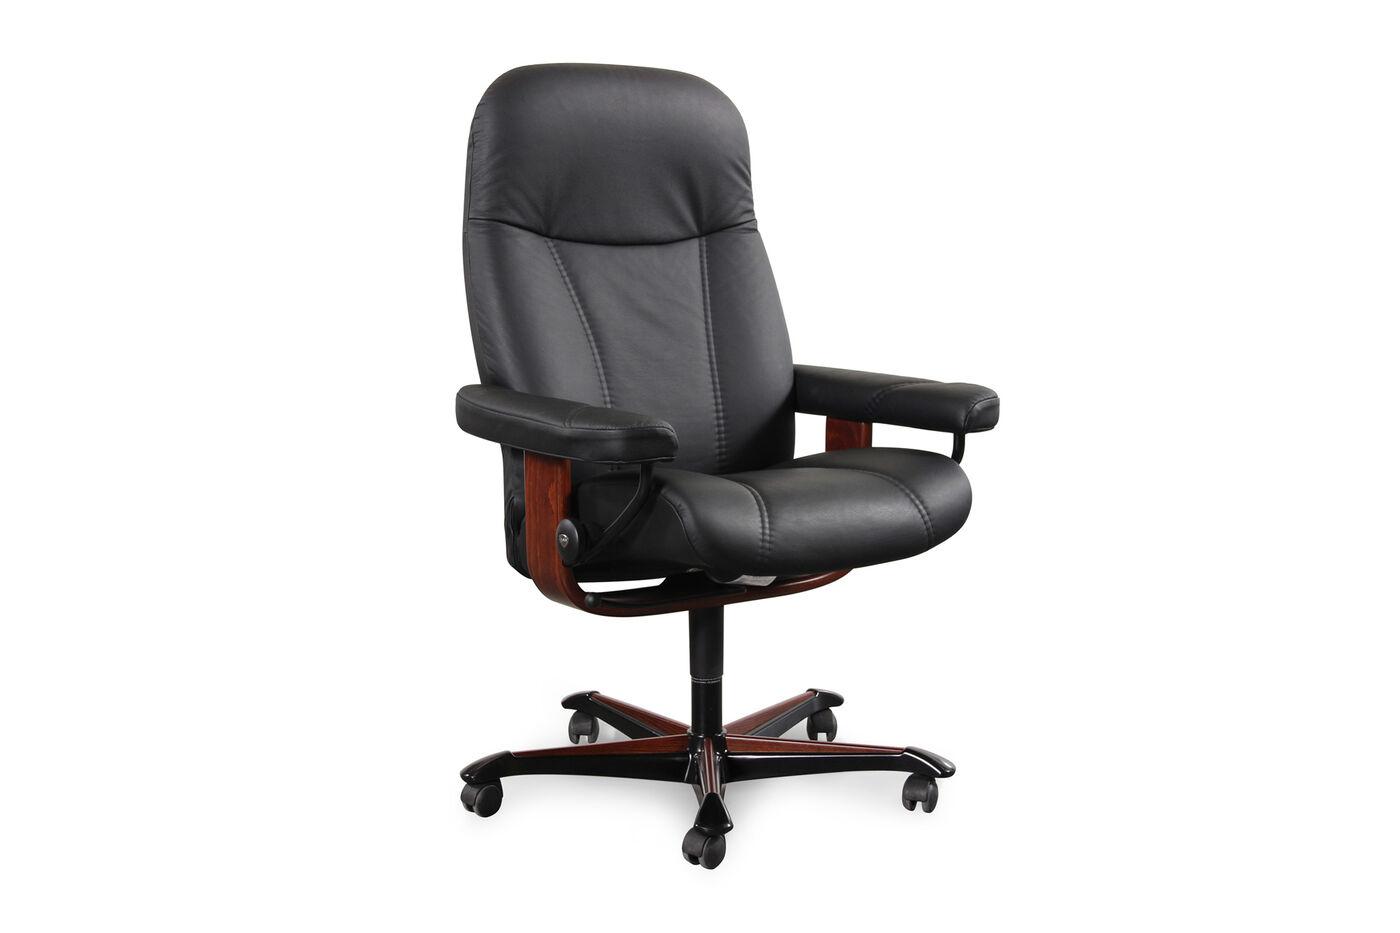 Leather Ergonomic Swivel Office Chair In Black Mathis